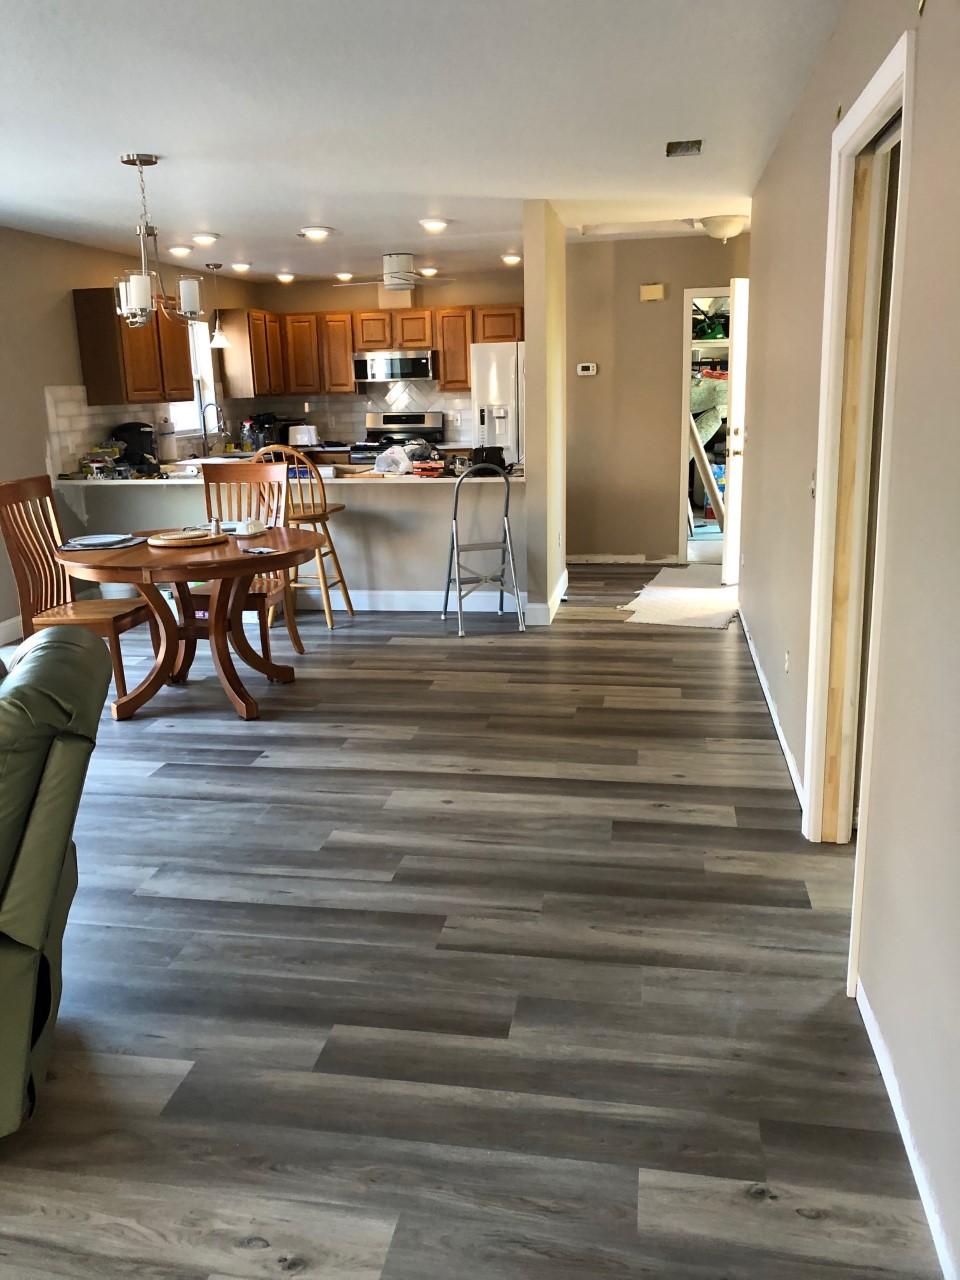 Home Renovations, 2020 - Page 2 02_02_17